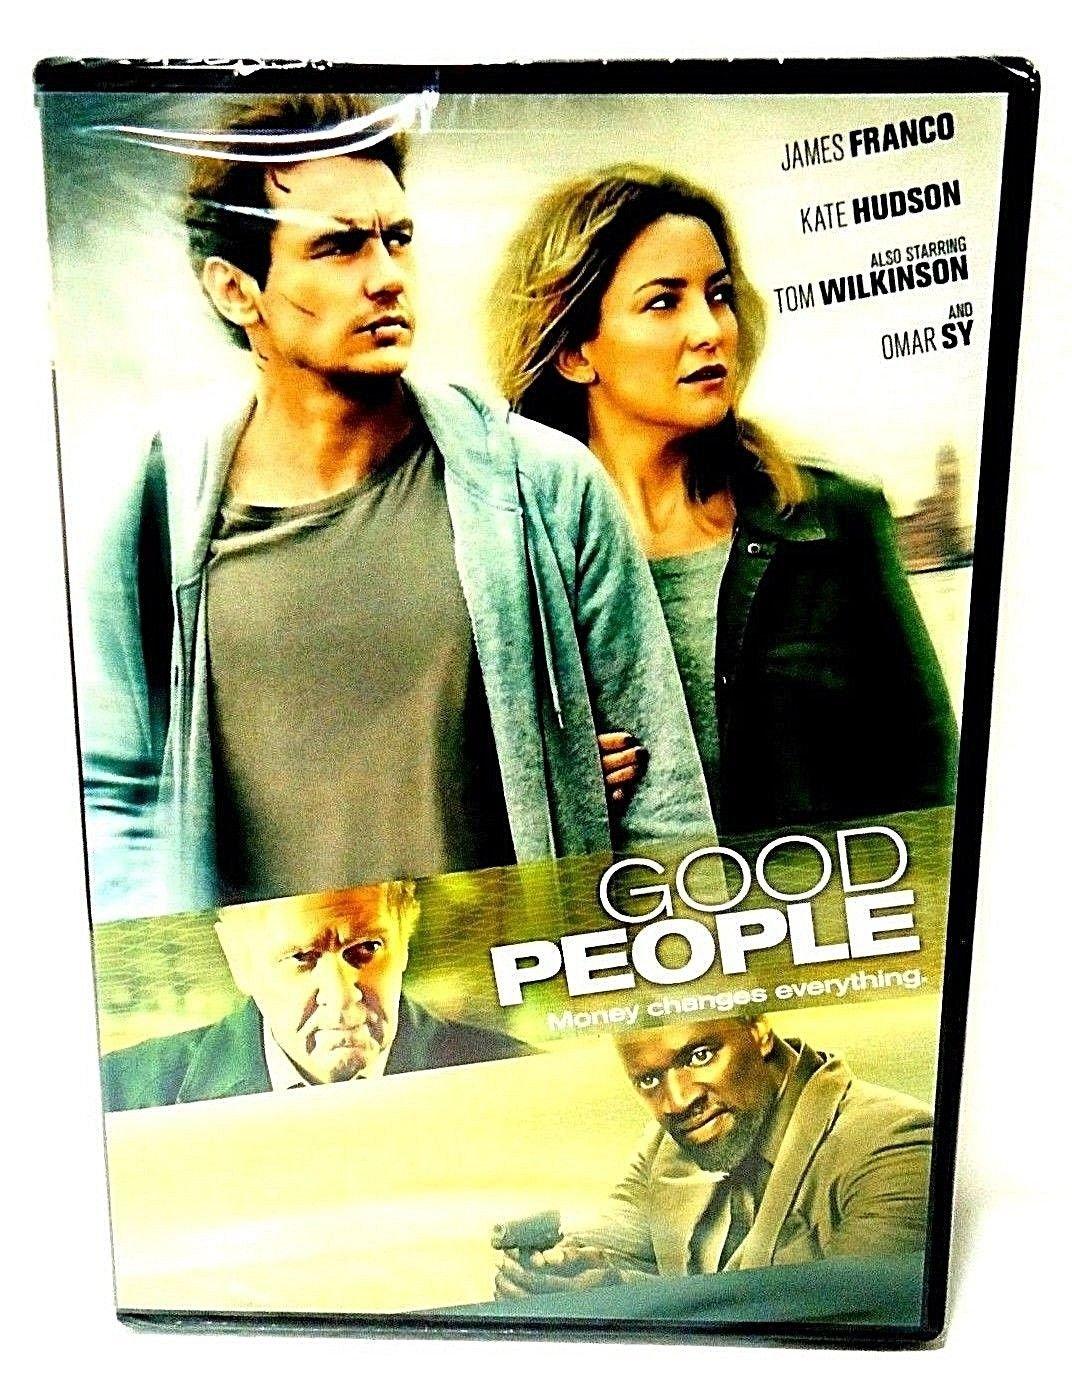 GOOD PEOPLE - DVD - JAMES FRANCO - KATE HUDSON - NEW - CRIME - THRILLER - MOVIE